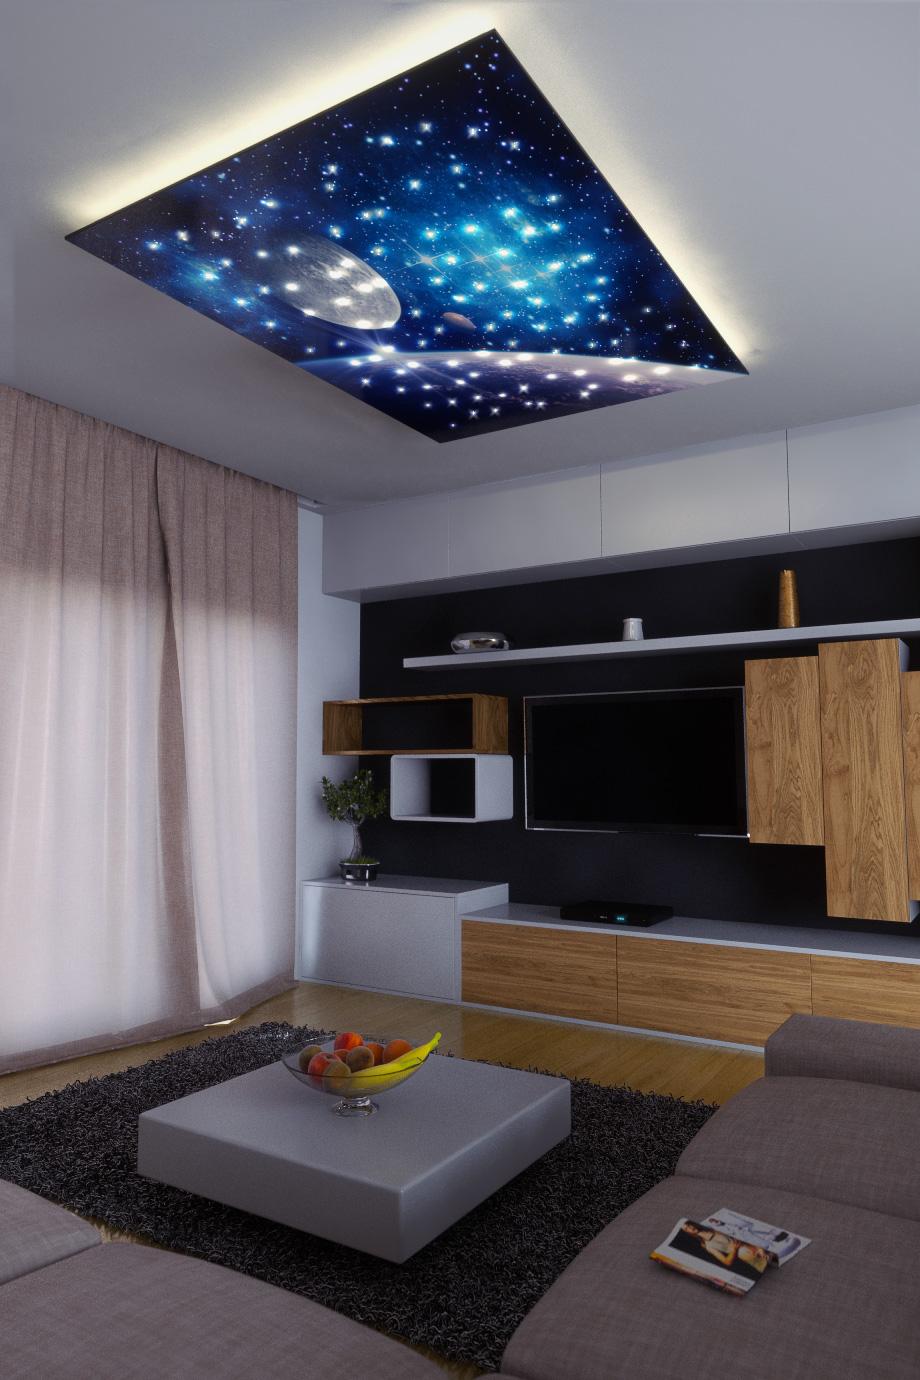 Fibre Optic Star Ceiling Easy Installation Stellar Lighting